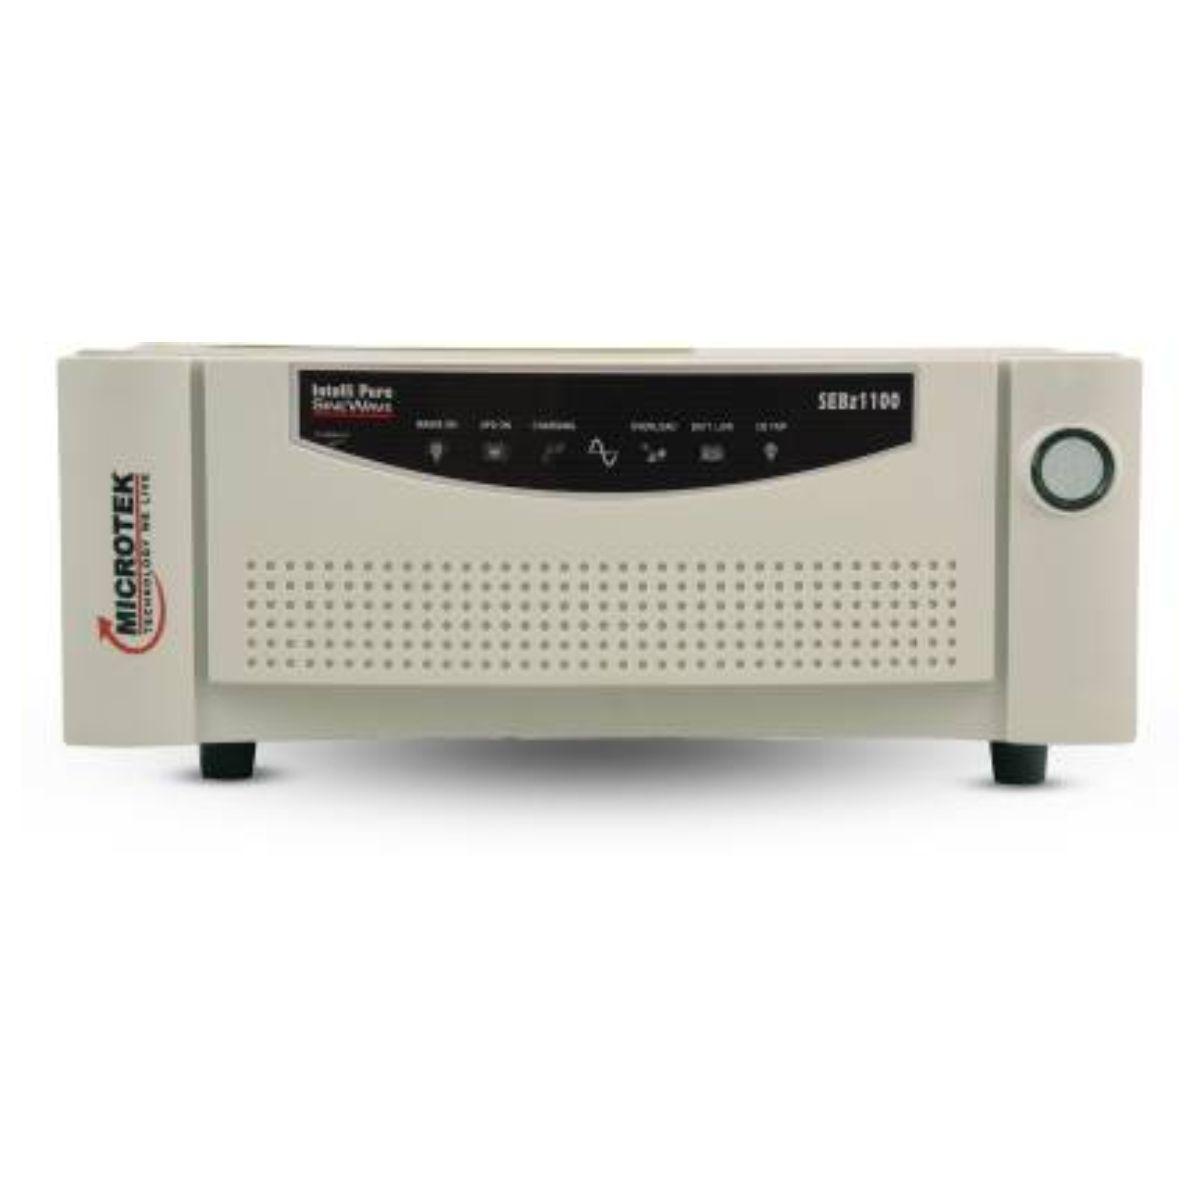 Microtek UPS SW EB1100 Pure Sine Wave Inverter